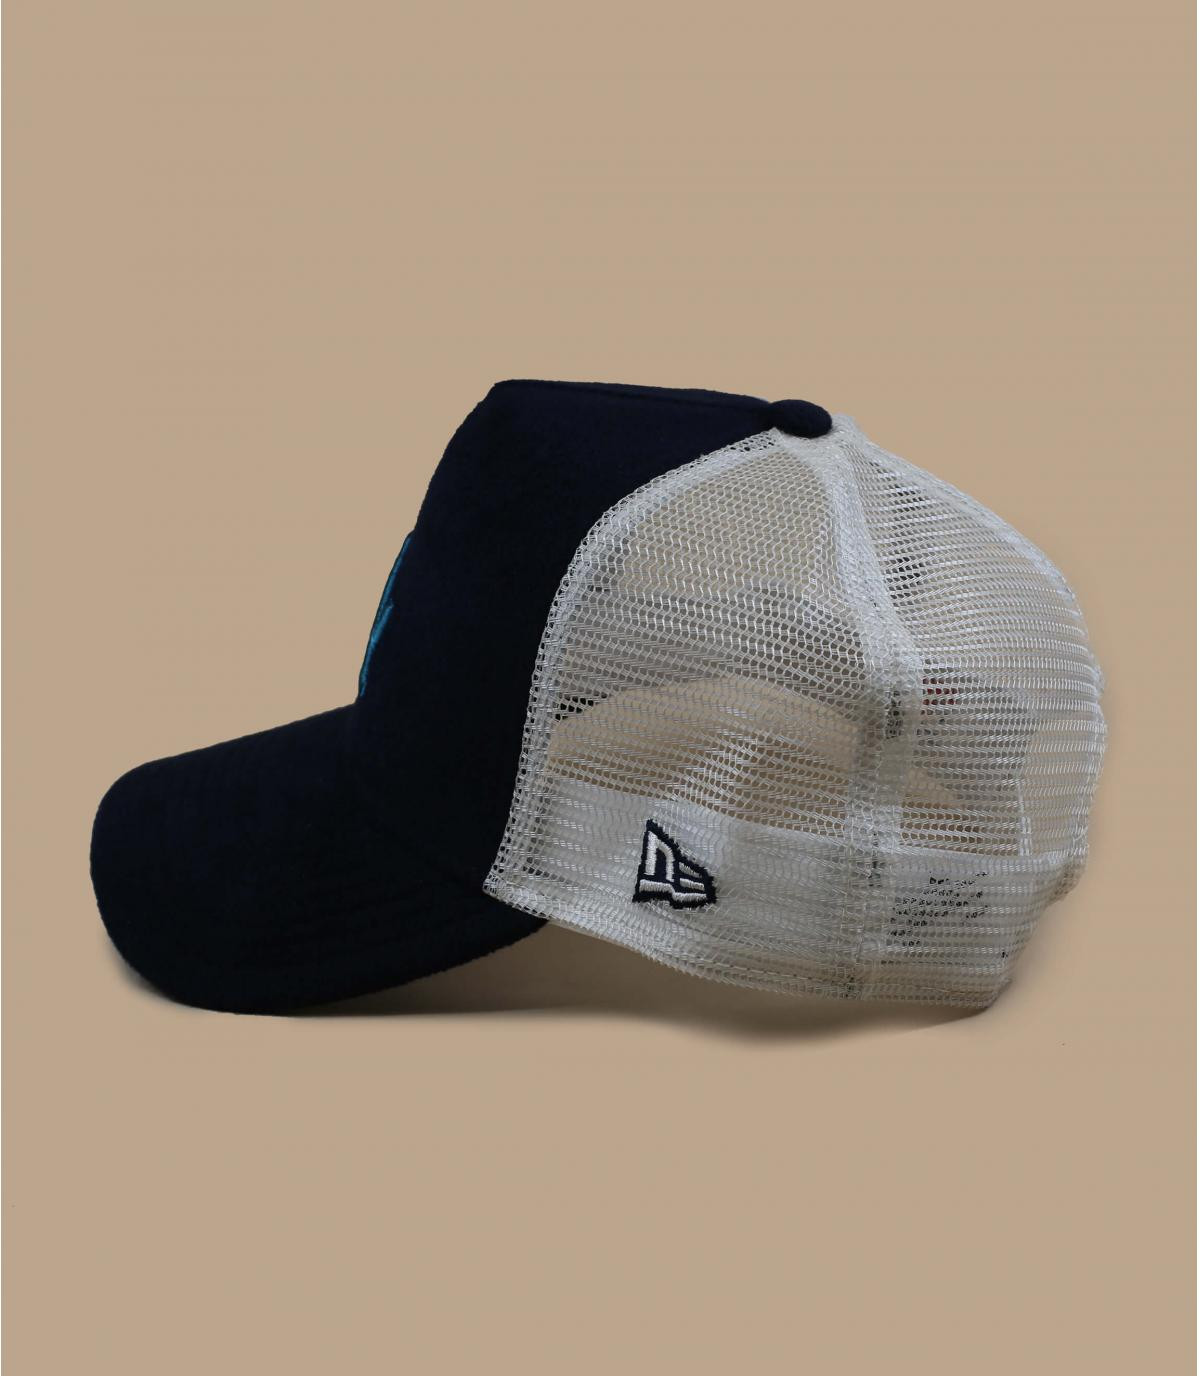 Détails Trucker MLB LA cadet blue - image 3